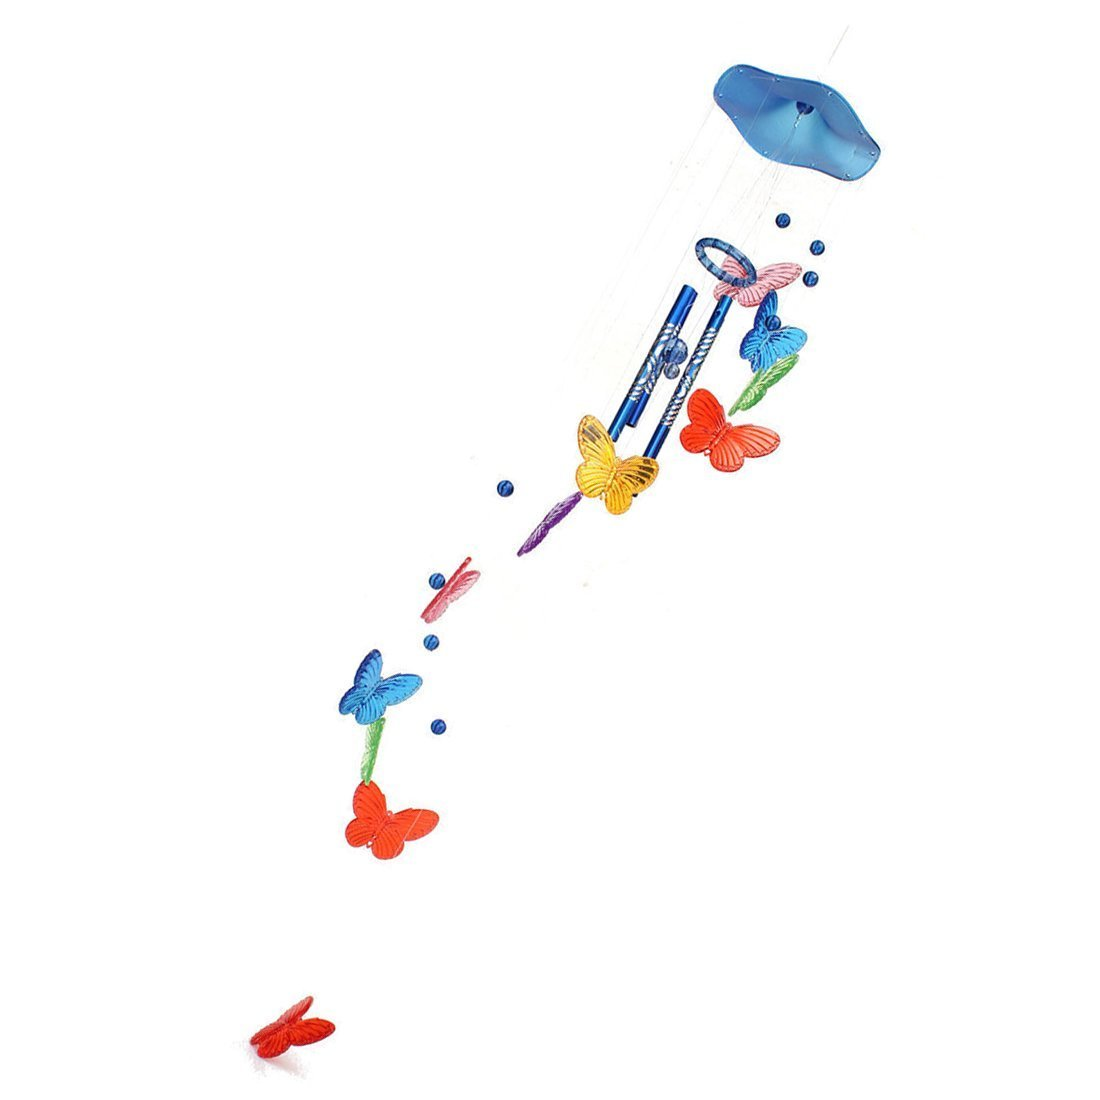 Schmetterling Campanula TOOGOO R Bunte Blau Windspiel Klangroehren Schmetterling Feng Shui Klangspiel Haus Deko